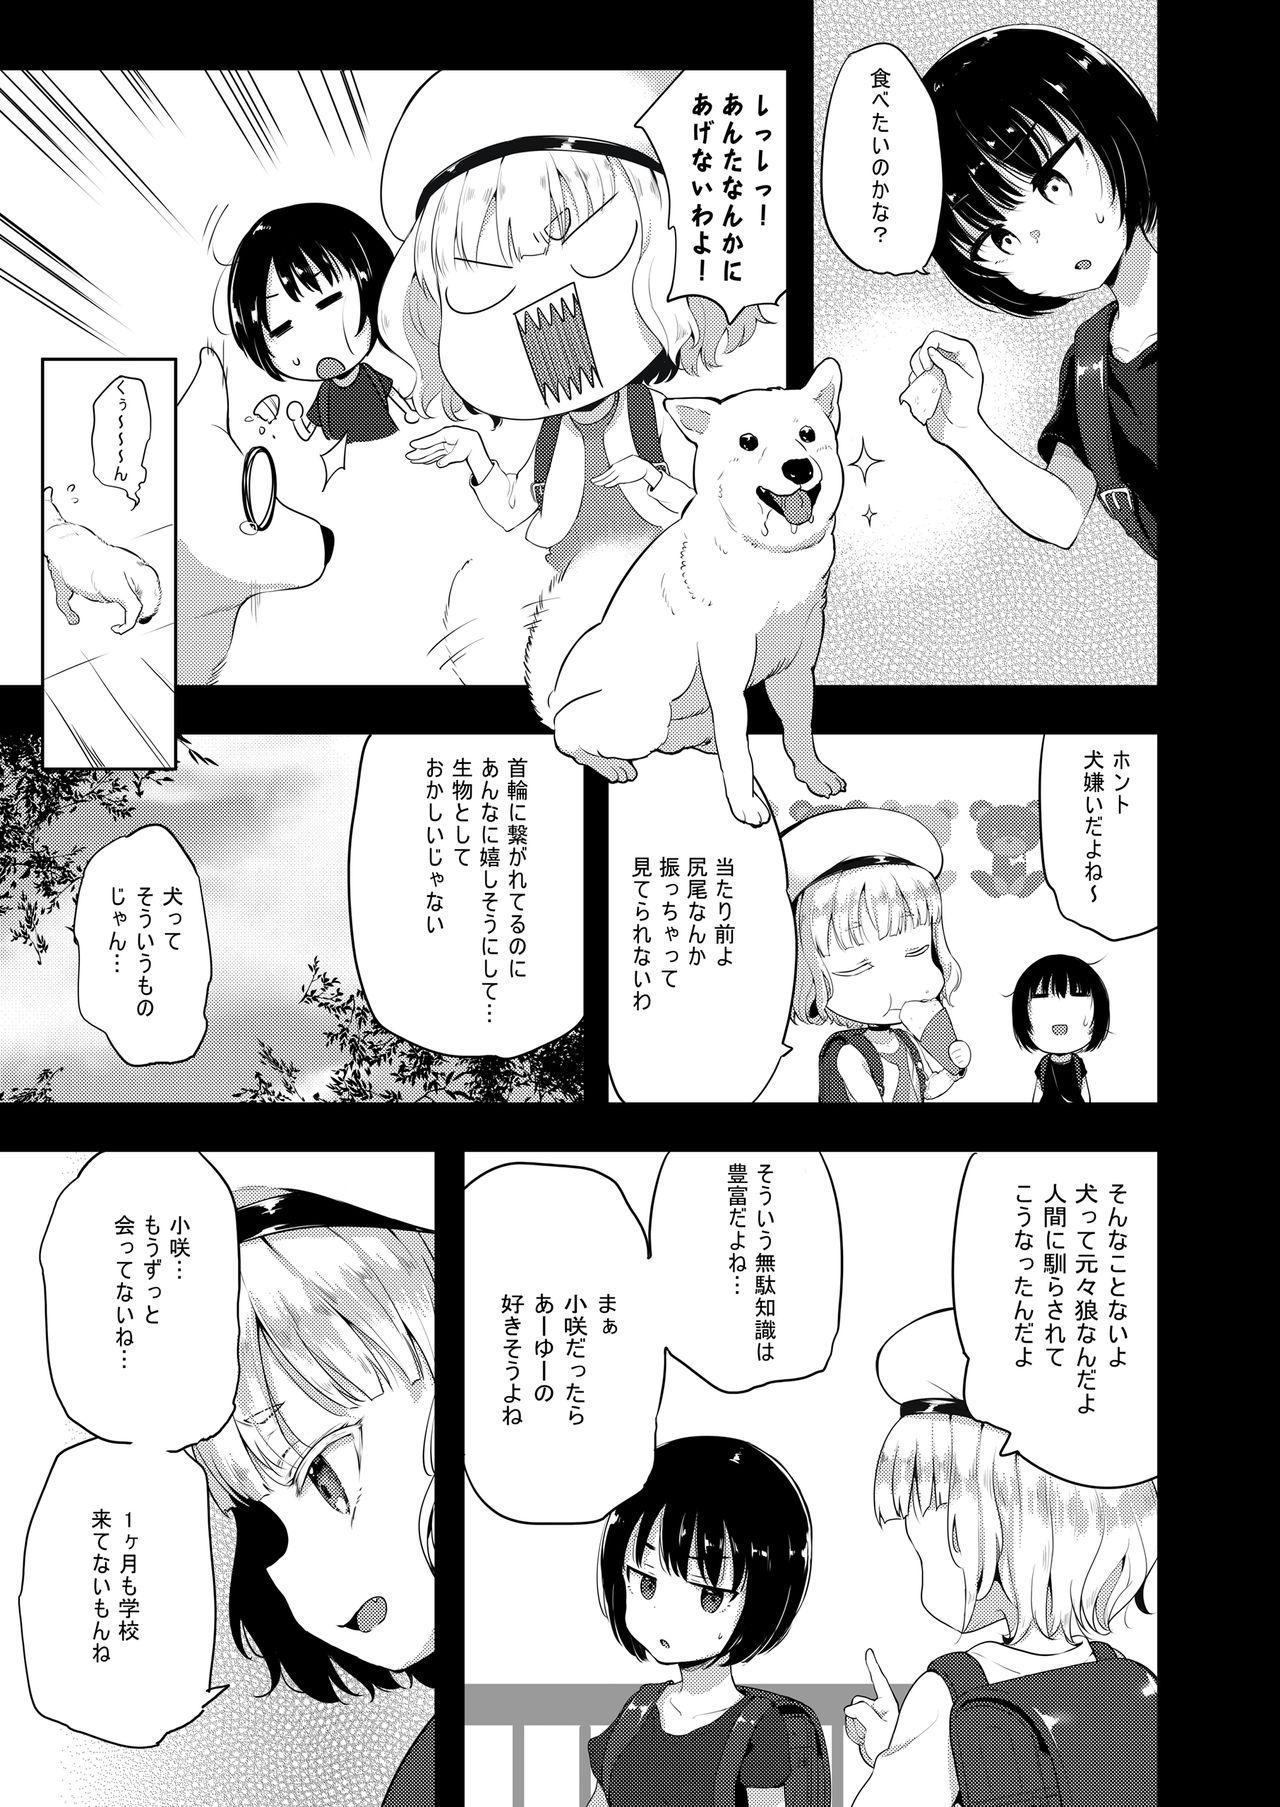 Seiyouken Choukyou 2 4